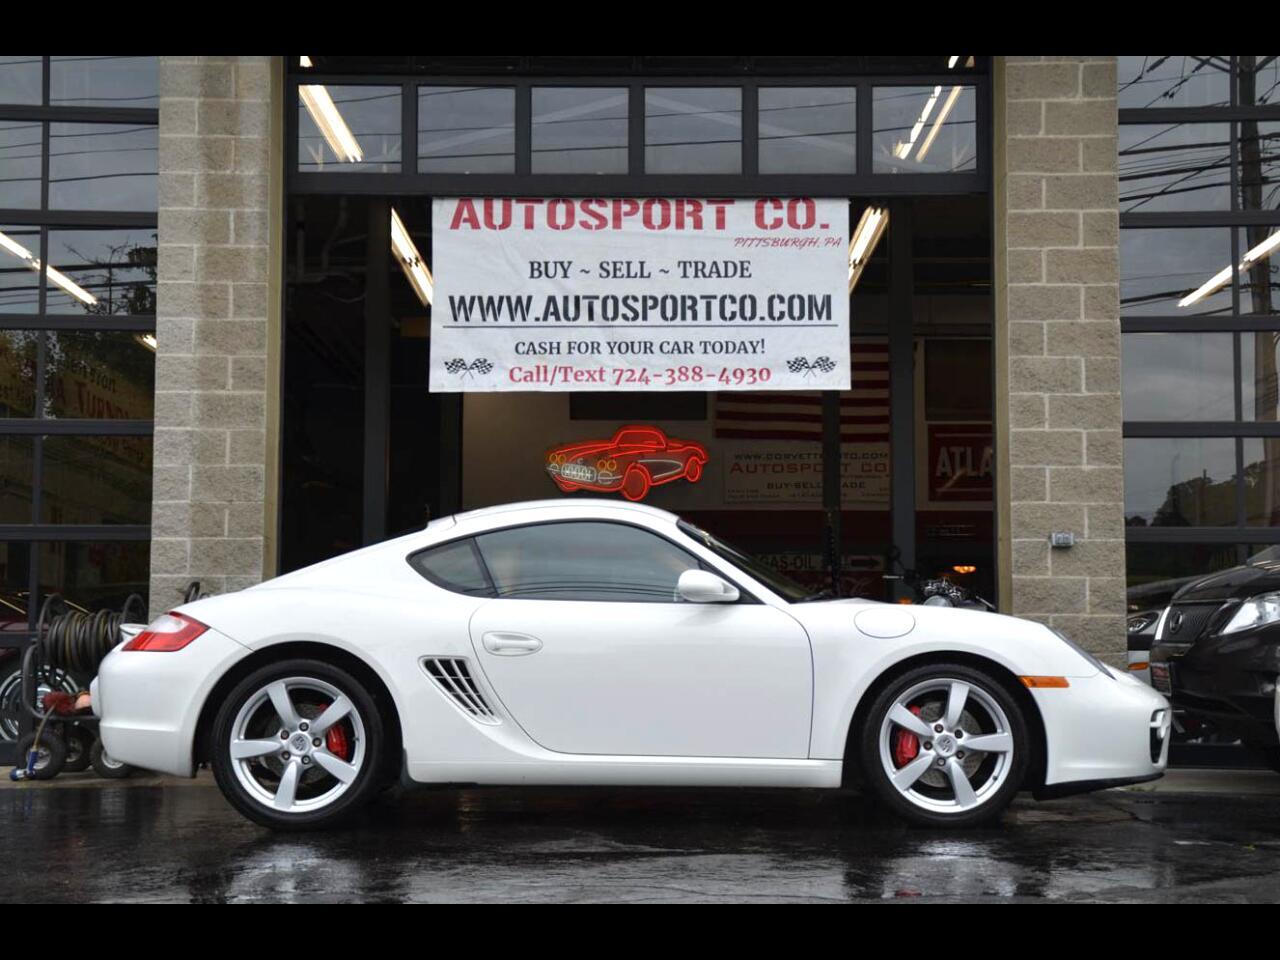 2006 Porsche Cayman S w/Sport Chrono Pkg.